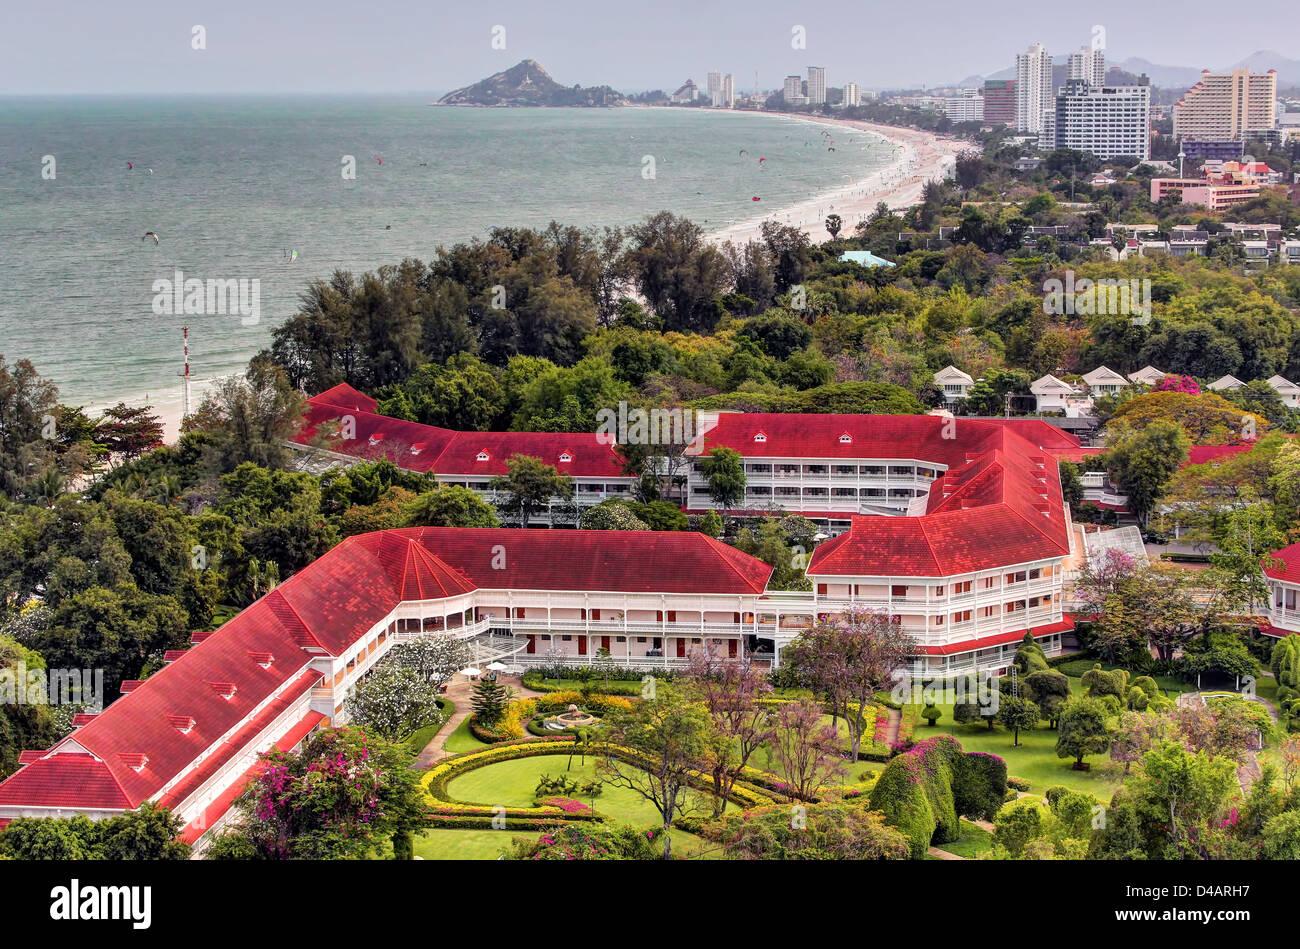 Hua Hin Central Beach View - Stock Image